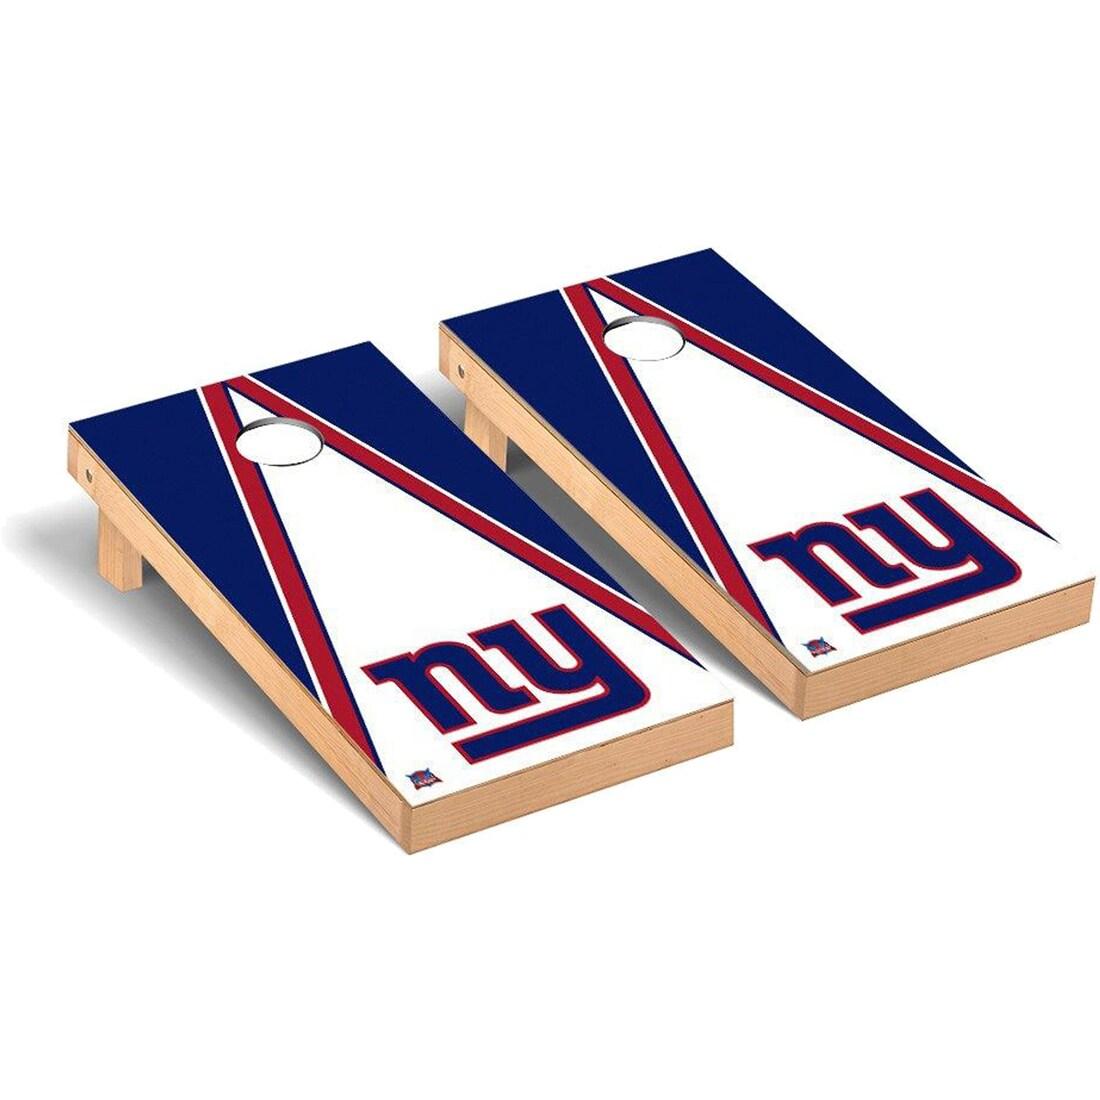 New York Giants 2' x 4' Triangle Cornhole Board Tailgate Toss Set